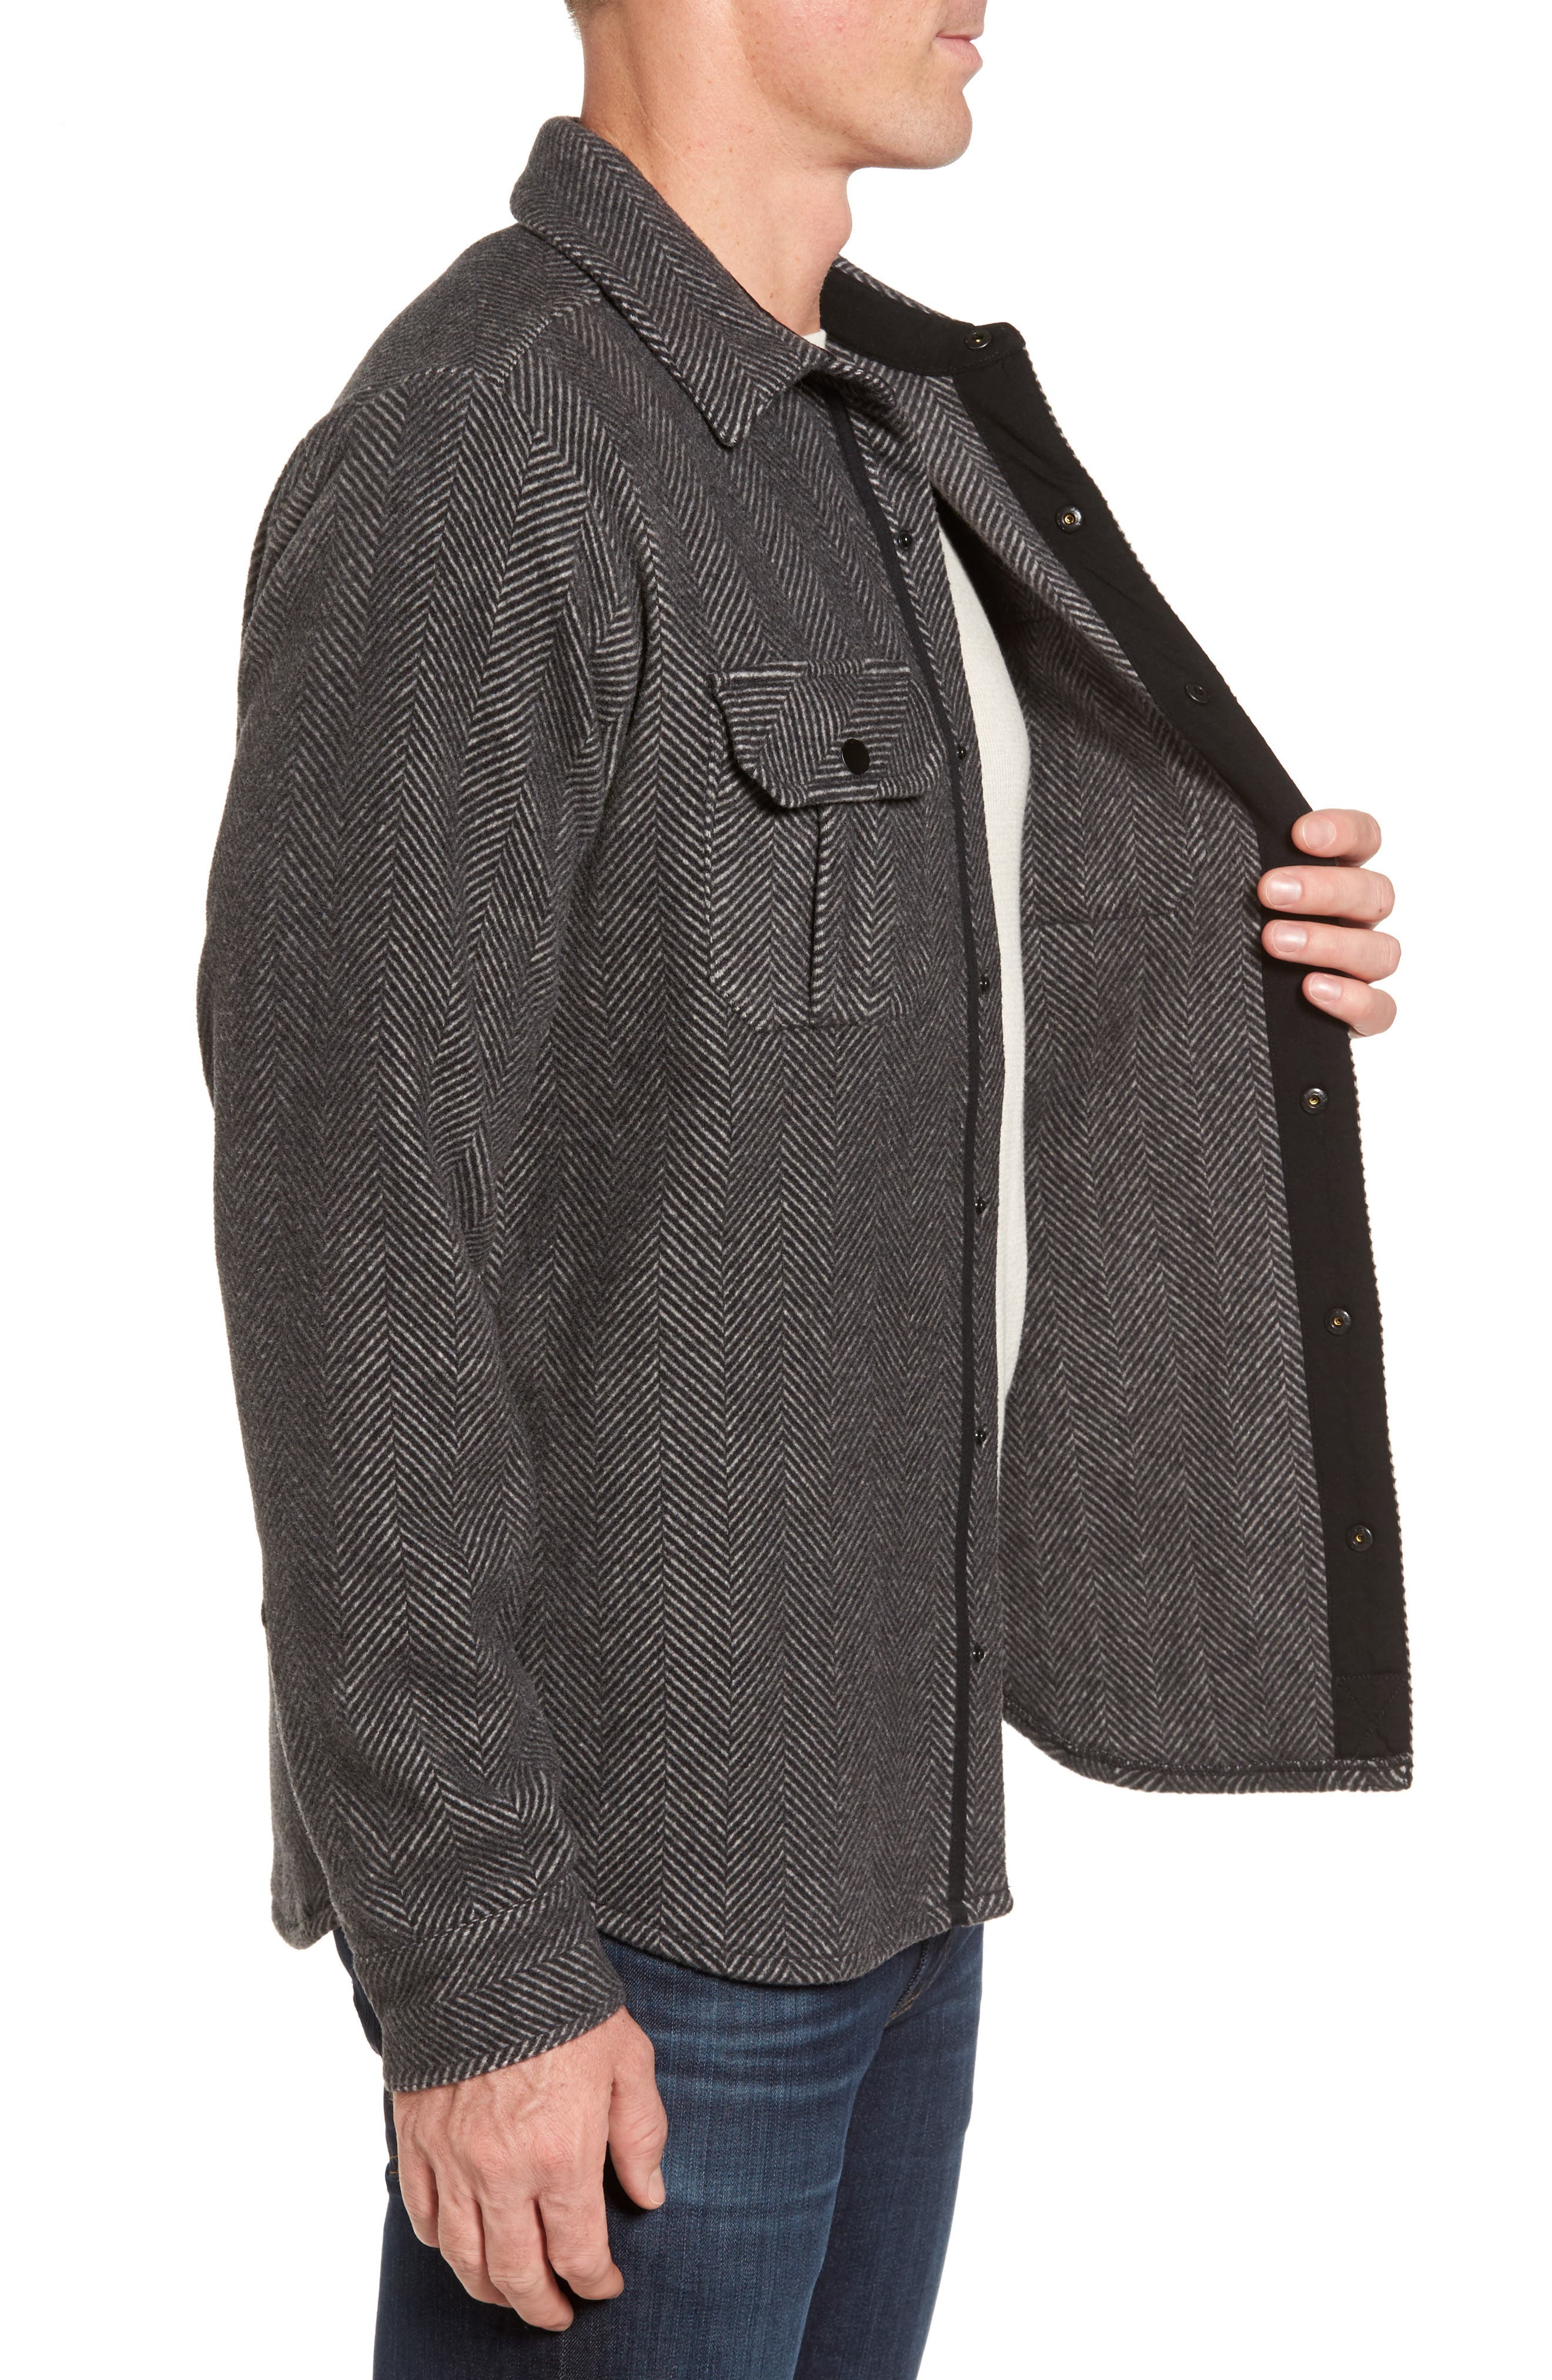 Anchor Line Herringbone Wool Blend Shirt Jacket,                             Alternate thumbnail 3, color,